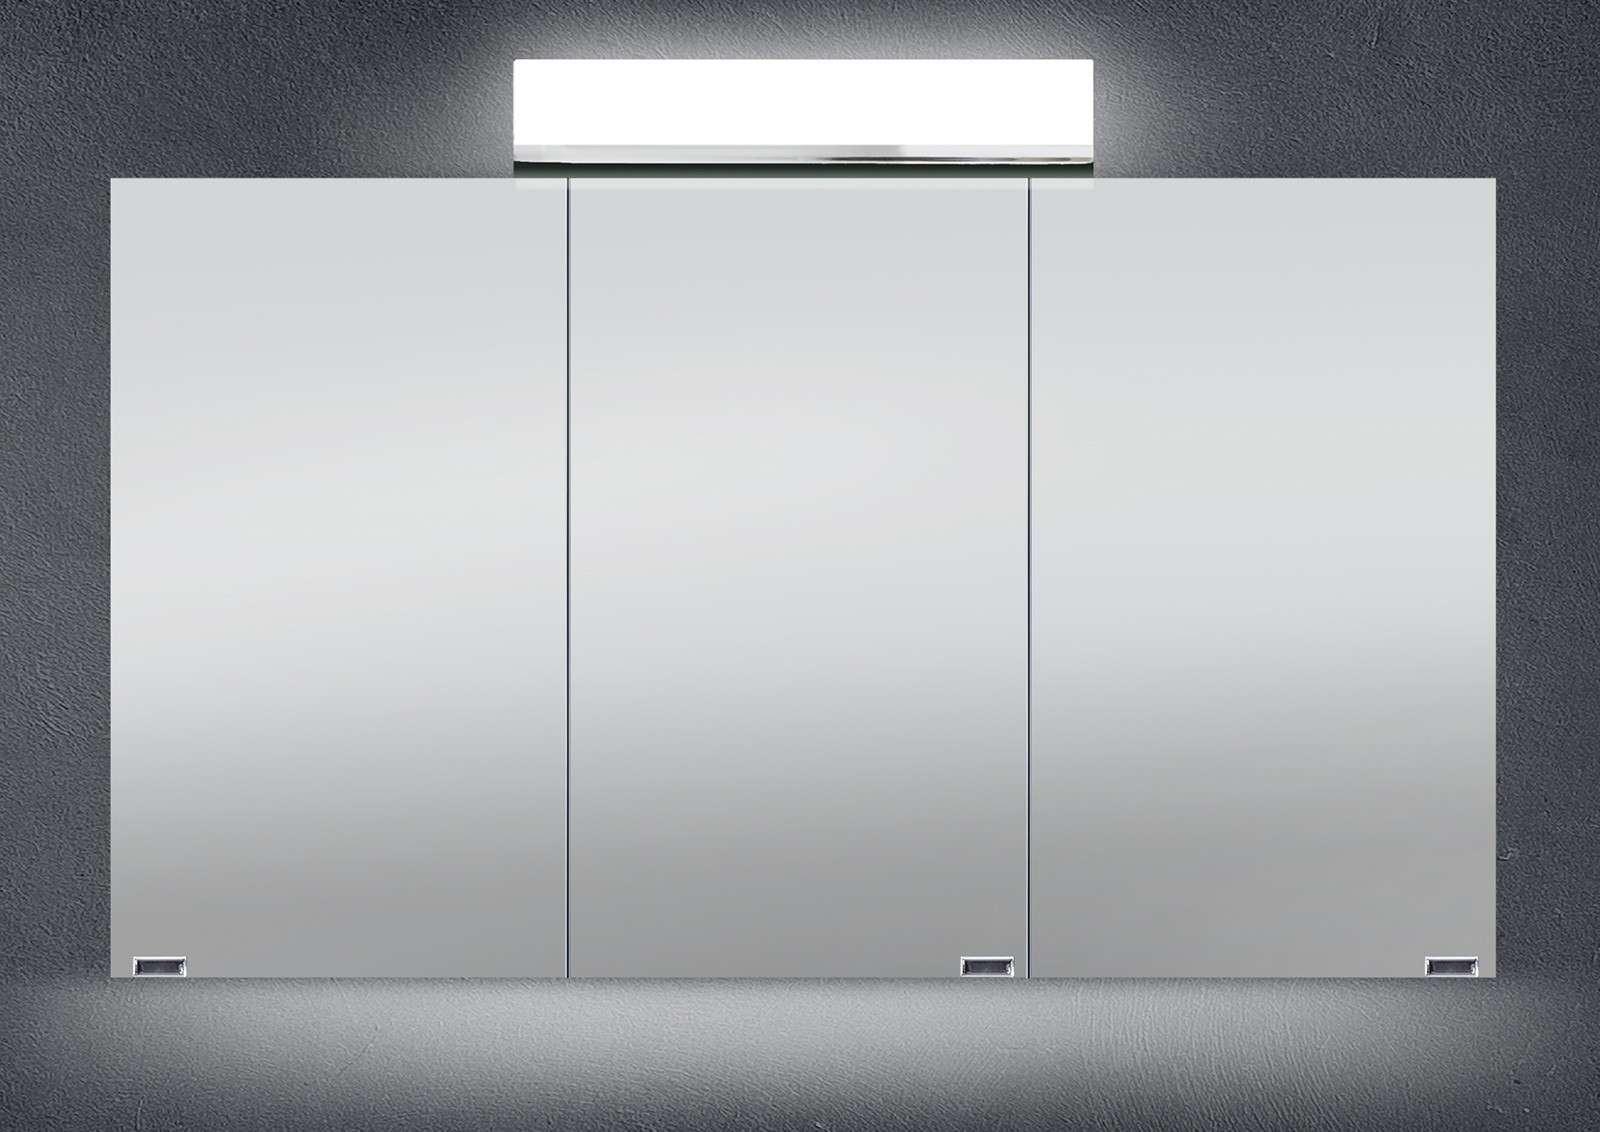 Spiegelschrank Bad 120 Cm LED Beleuchtung Doppelseitig Verspiegelt |  Designbaeder.com